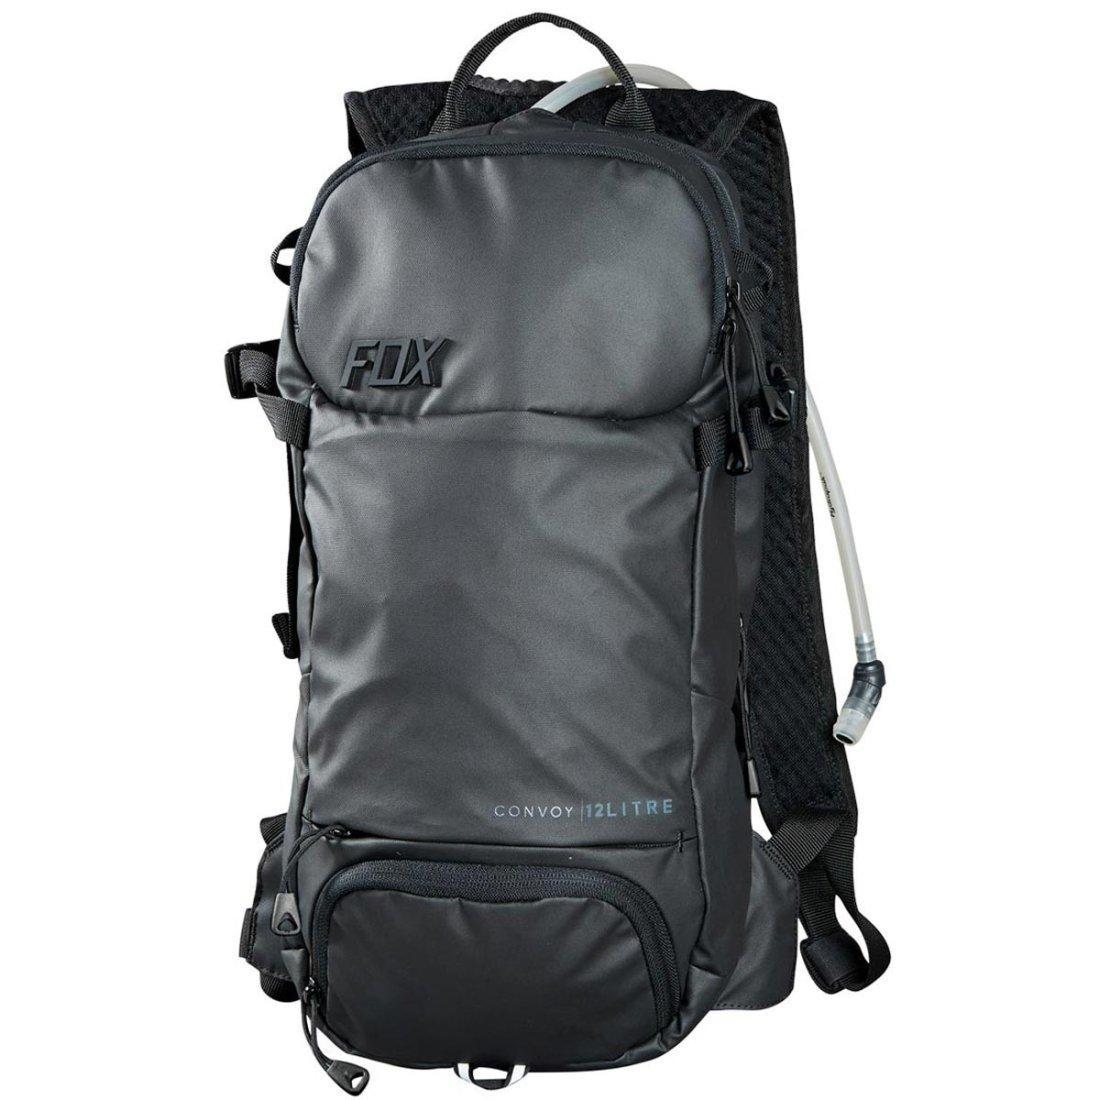 33901ac64b FOX Convoy Hydration Pack Black Bag · Motocard